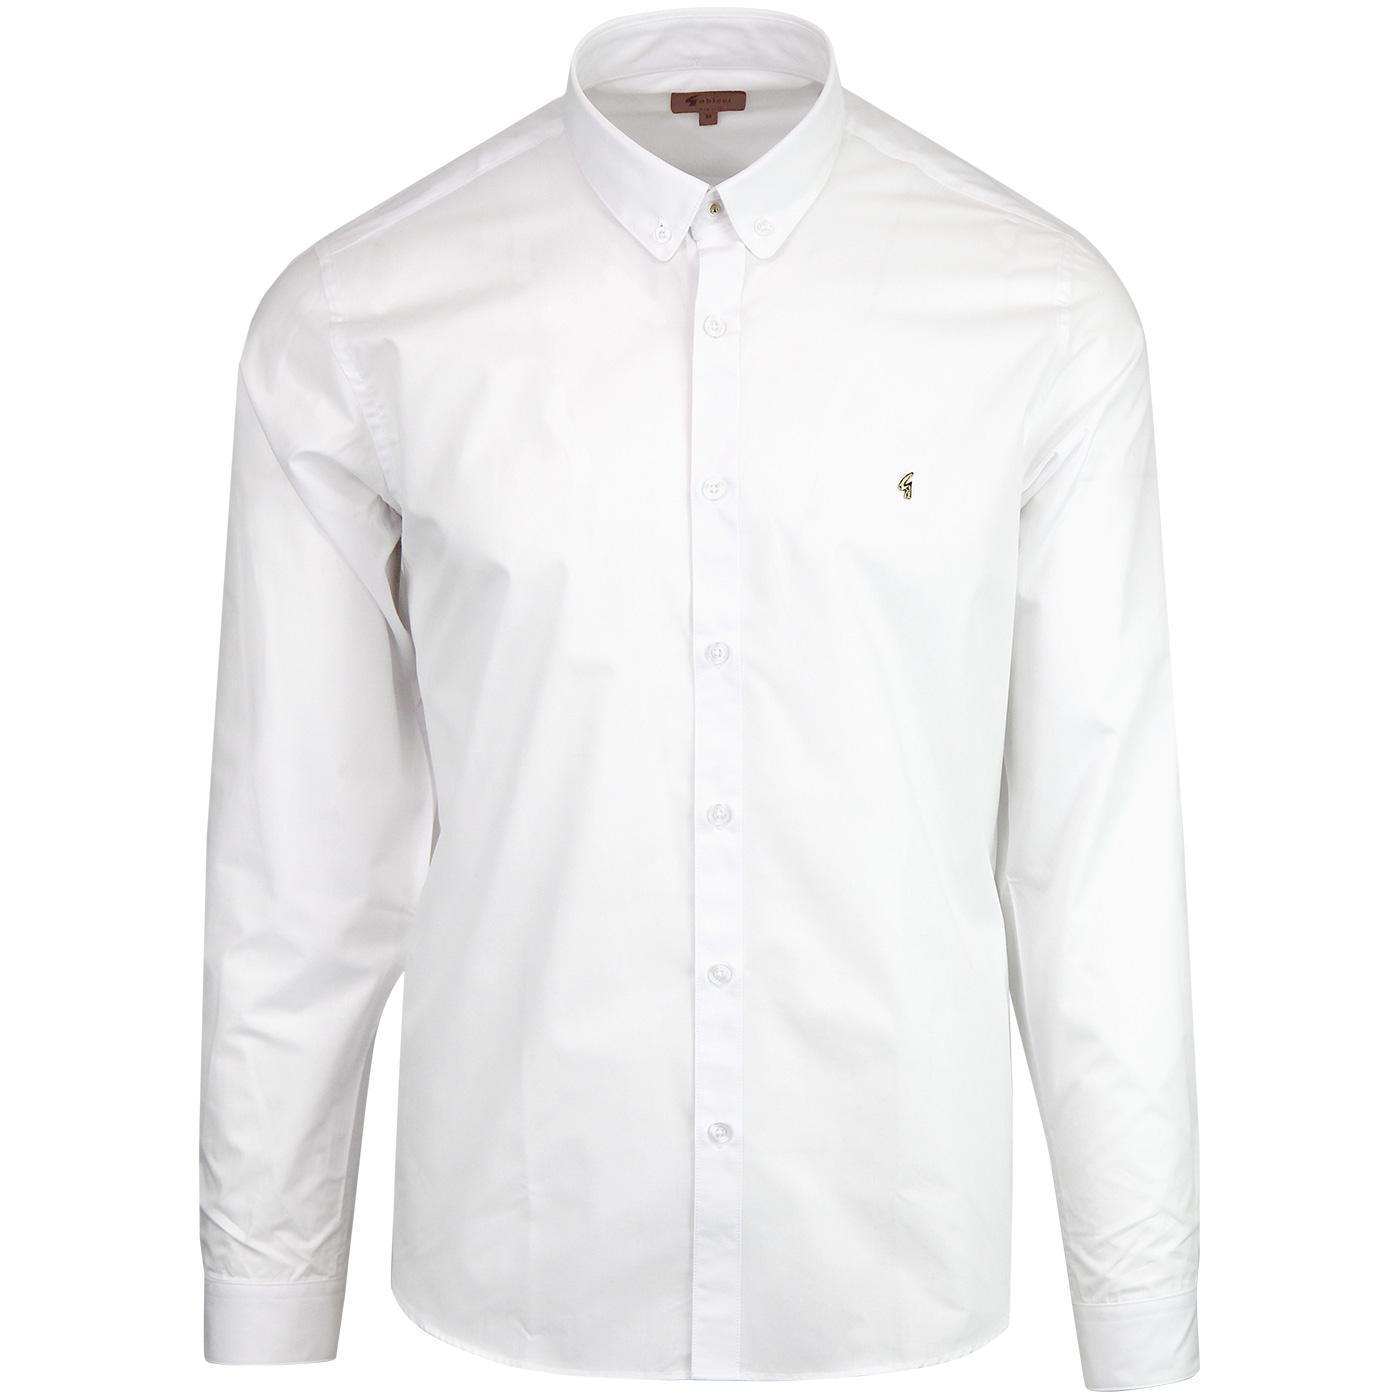 Antonio GABICCI VINTAGE 60s Mod Stud Collar Shirt